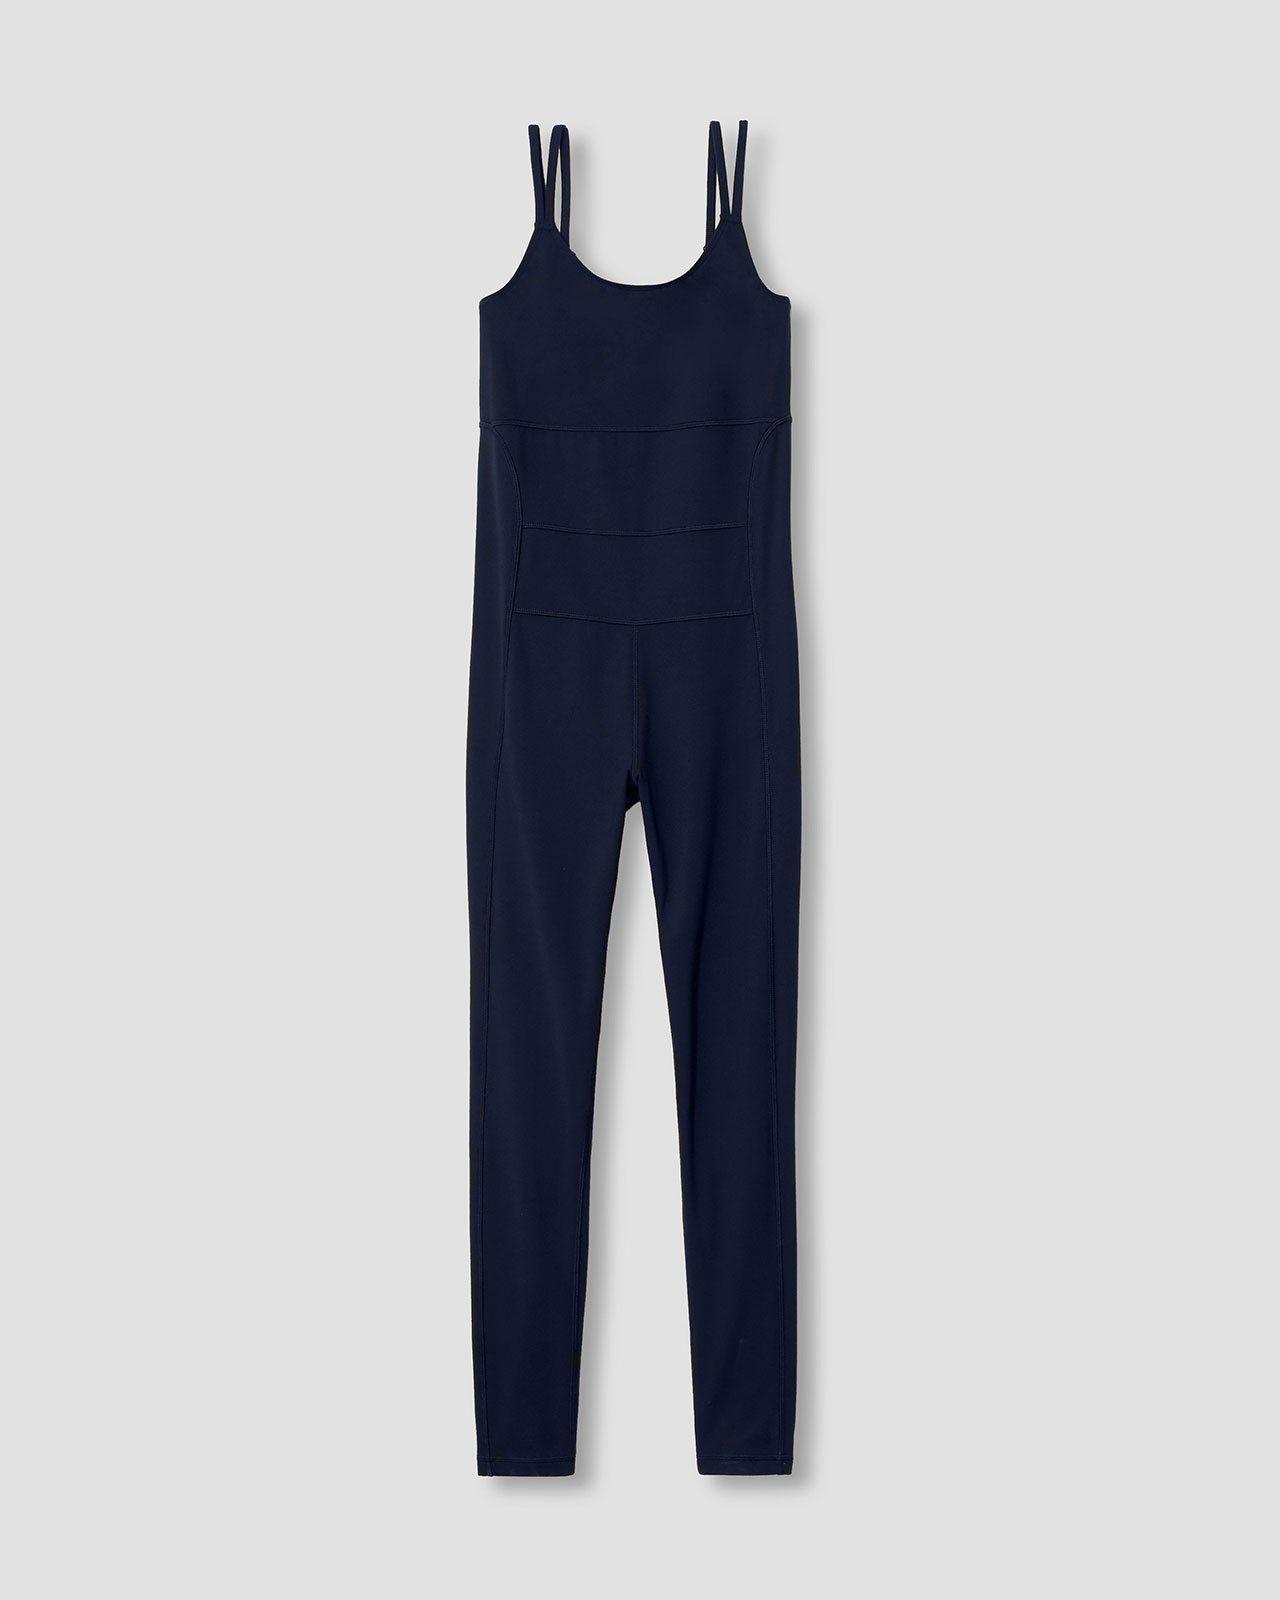 Universal Standard Next-to-Naked Bodysuit